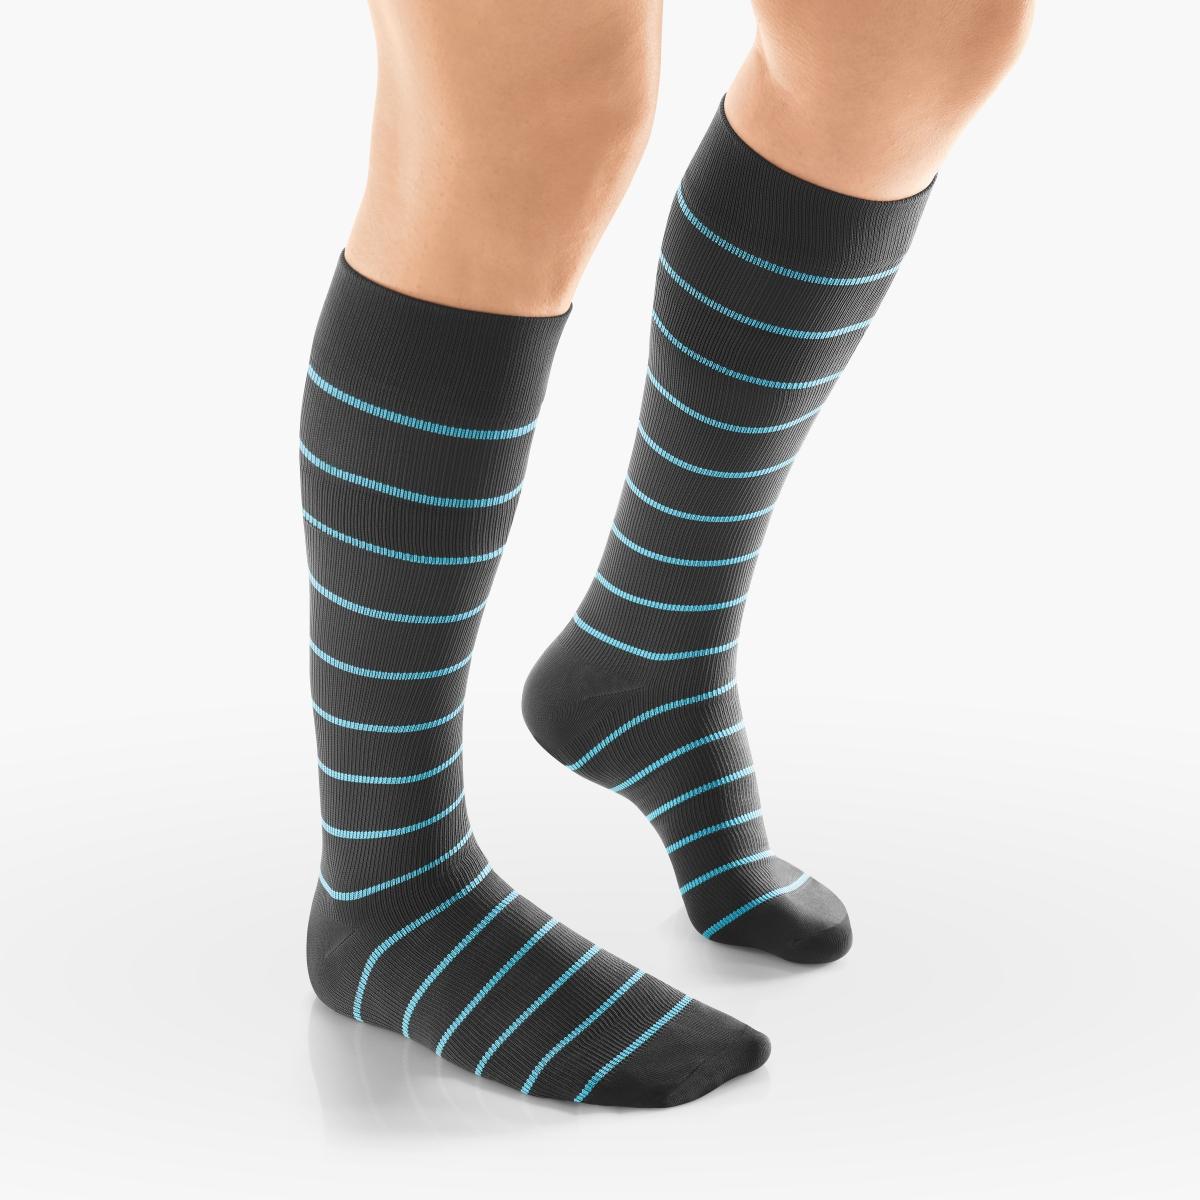 VENOSAN Sup F Women, Stripe, Below Knee 15-20, Charcoal/Blue, S/M, Regular Moderate 15-20 mmHg | Charcoal/Blue | S/M | Regular | Closed Toe | Knit Top